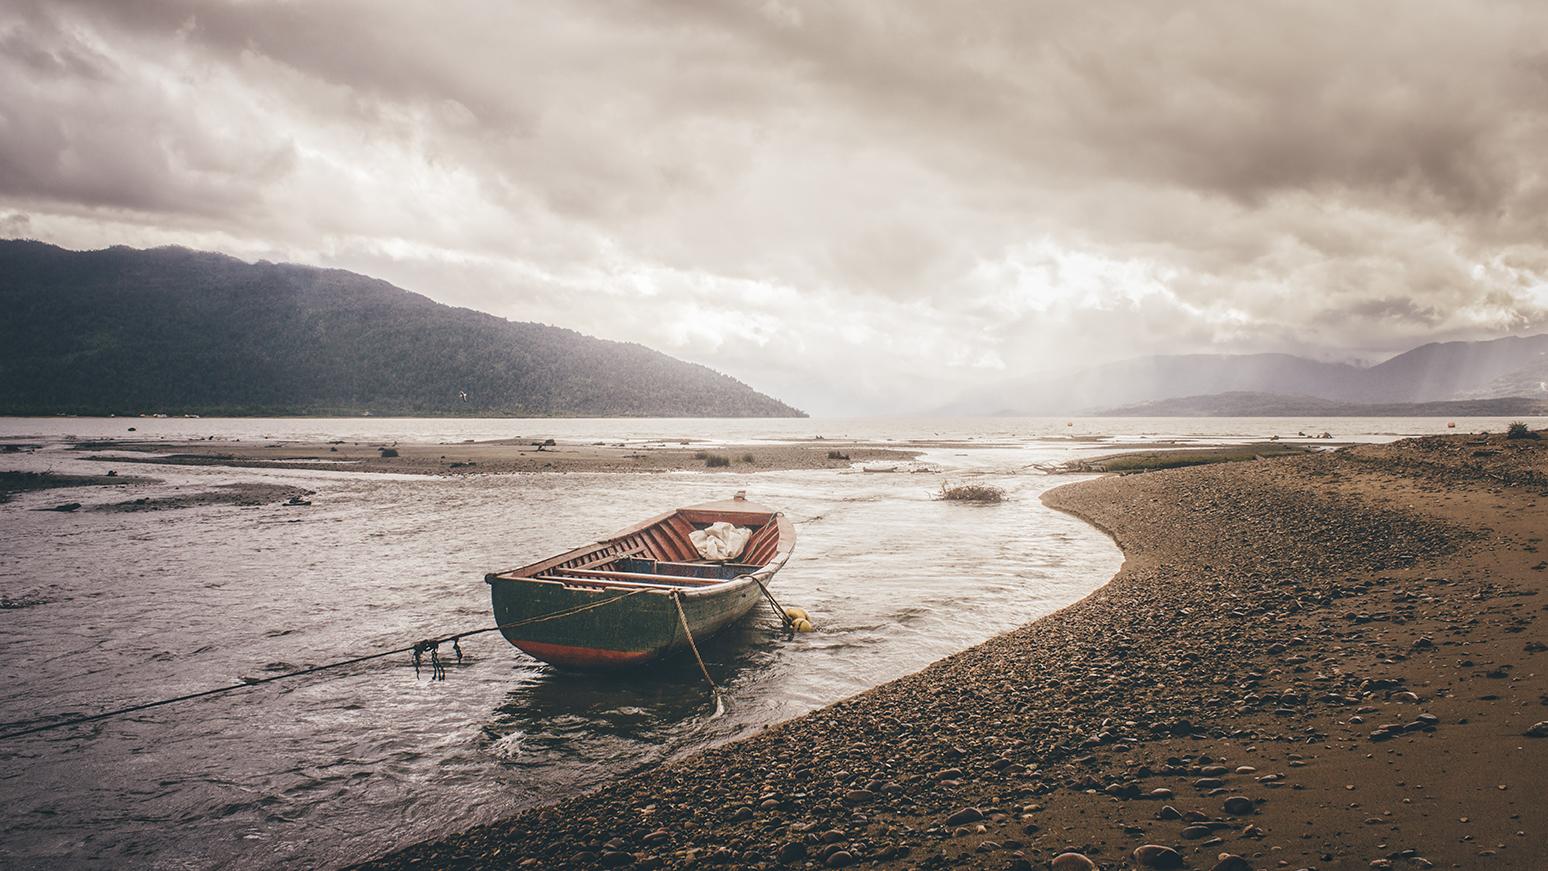 Puerto Cisnes | Martín González Bravo